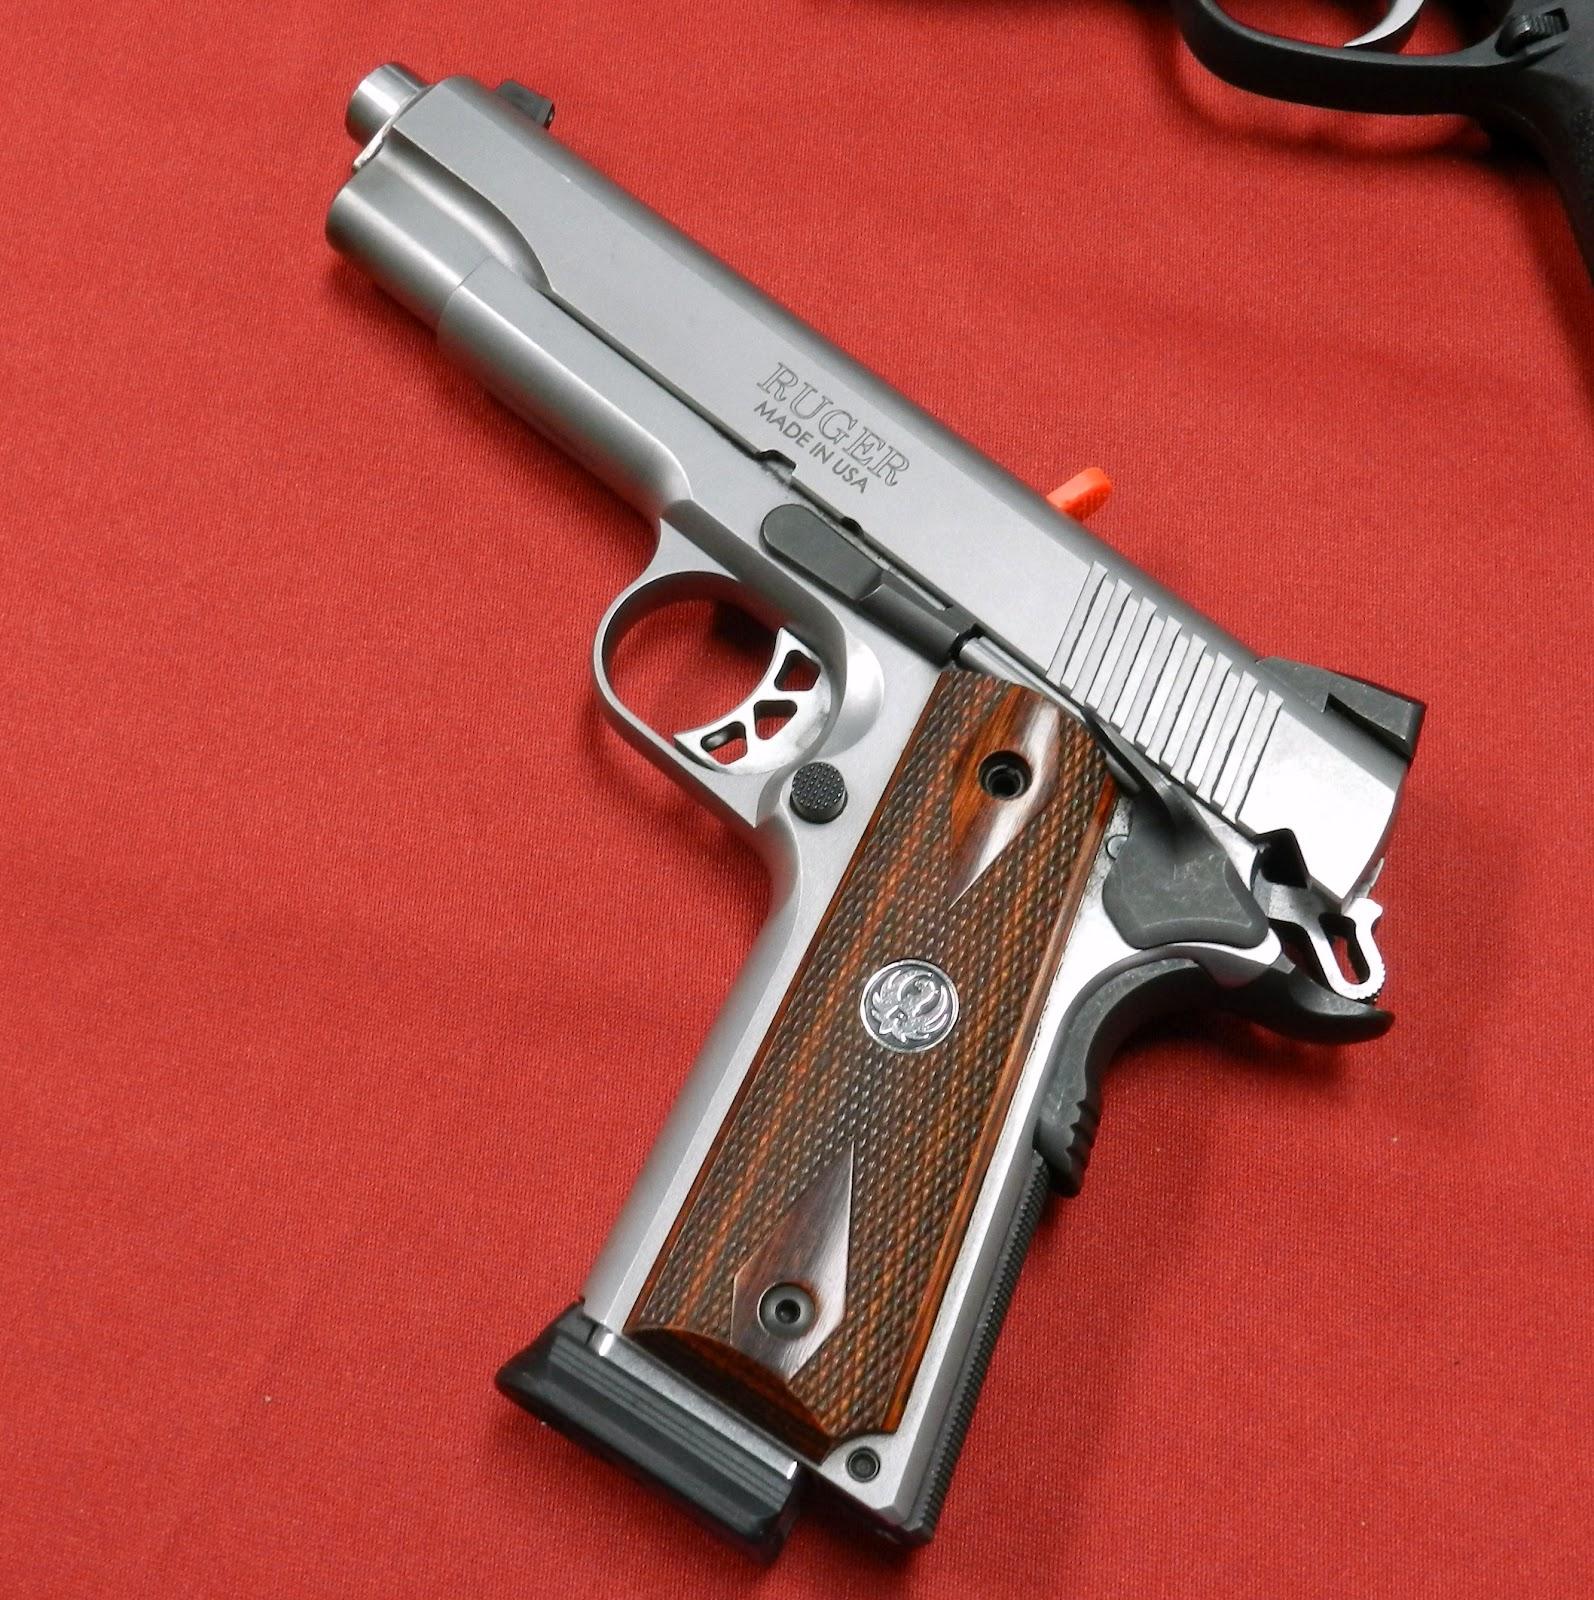 Average Joe's Handgun Reviews: Bill's Gun Shop and Range ...